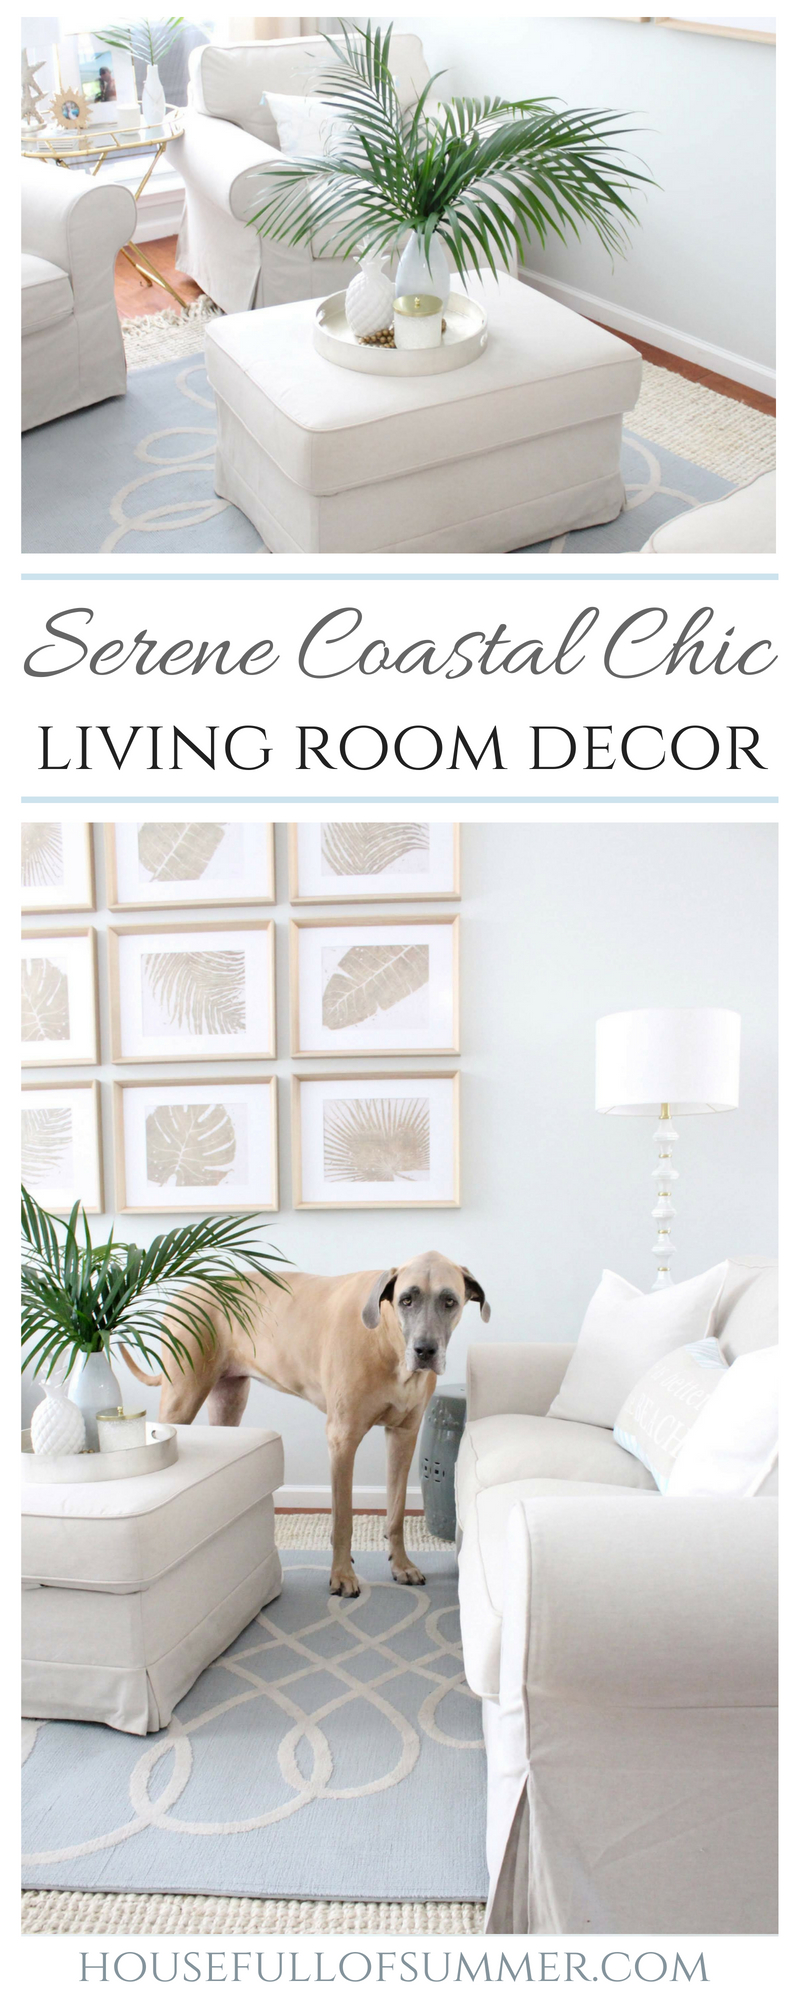 Serene Coastal Chic Living Room Decor   House Full Of Summer Coastal Home  Interior, Palm